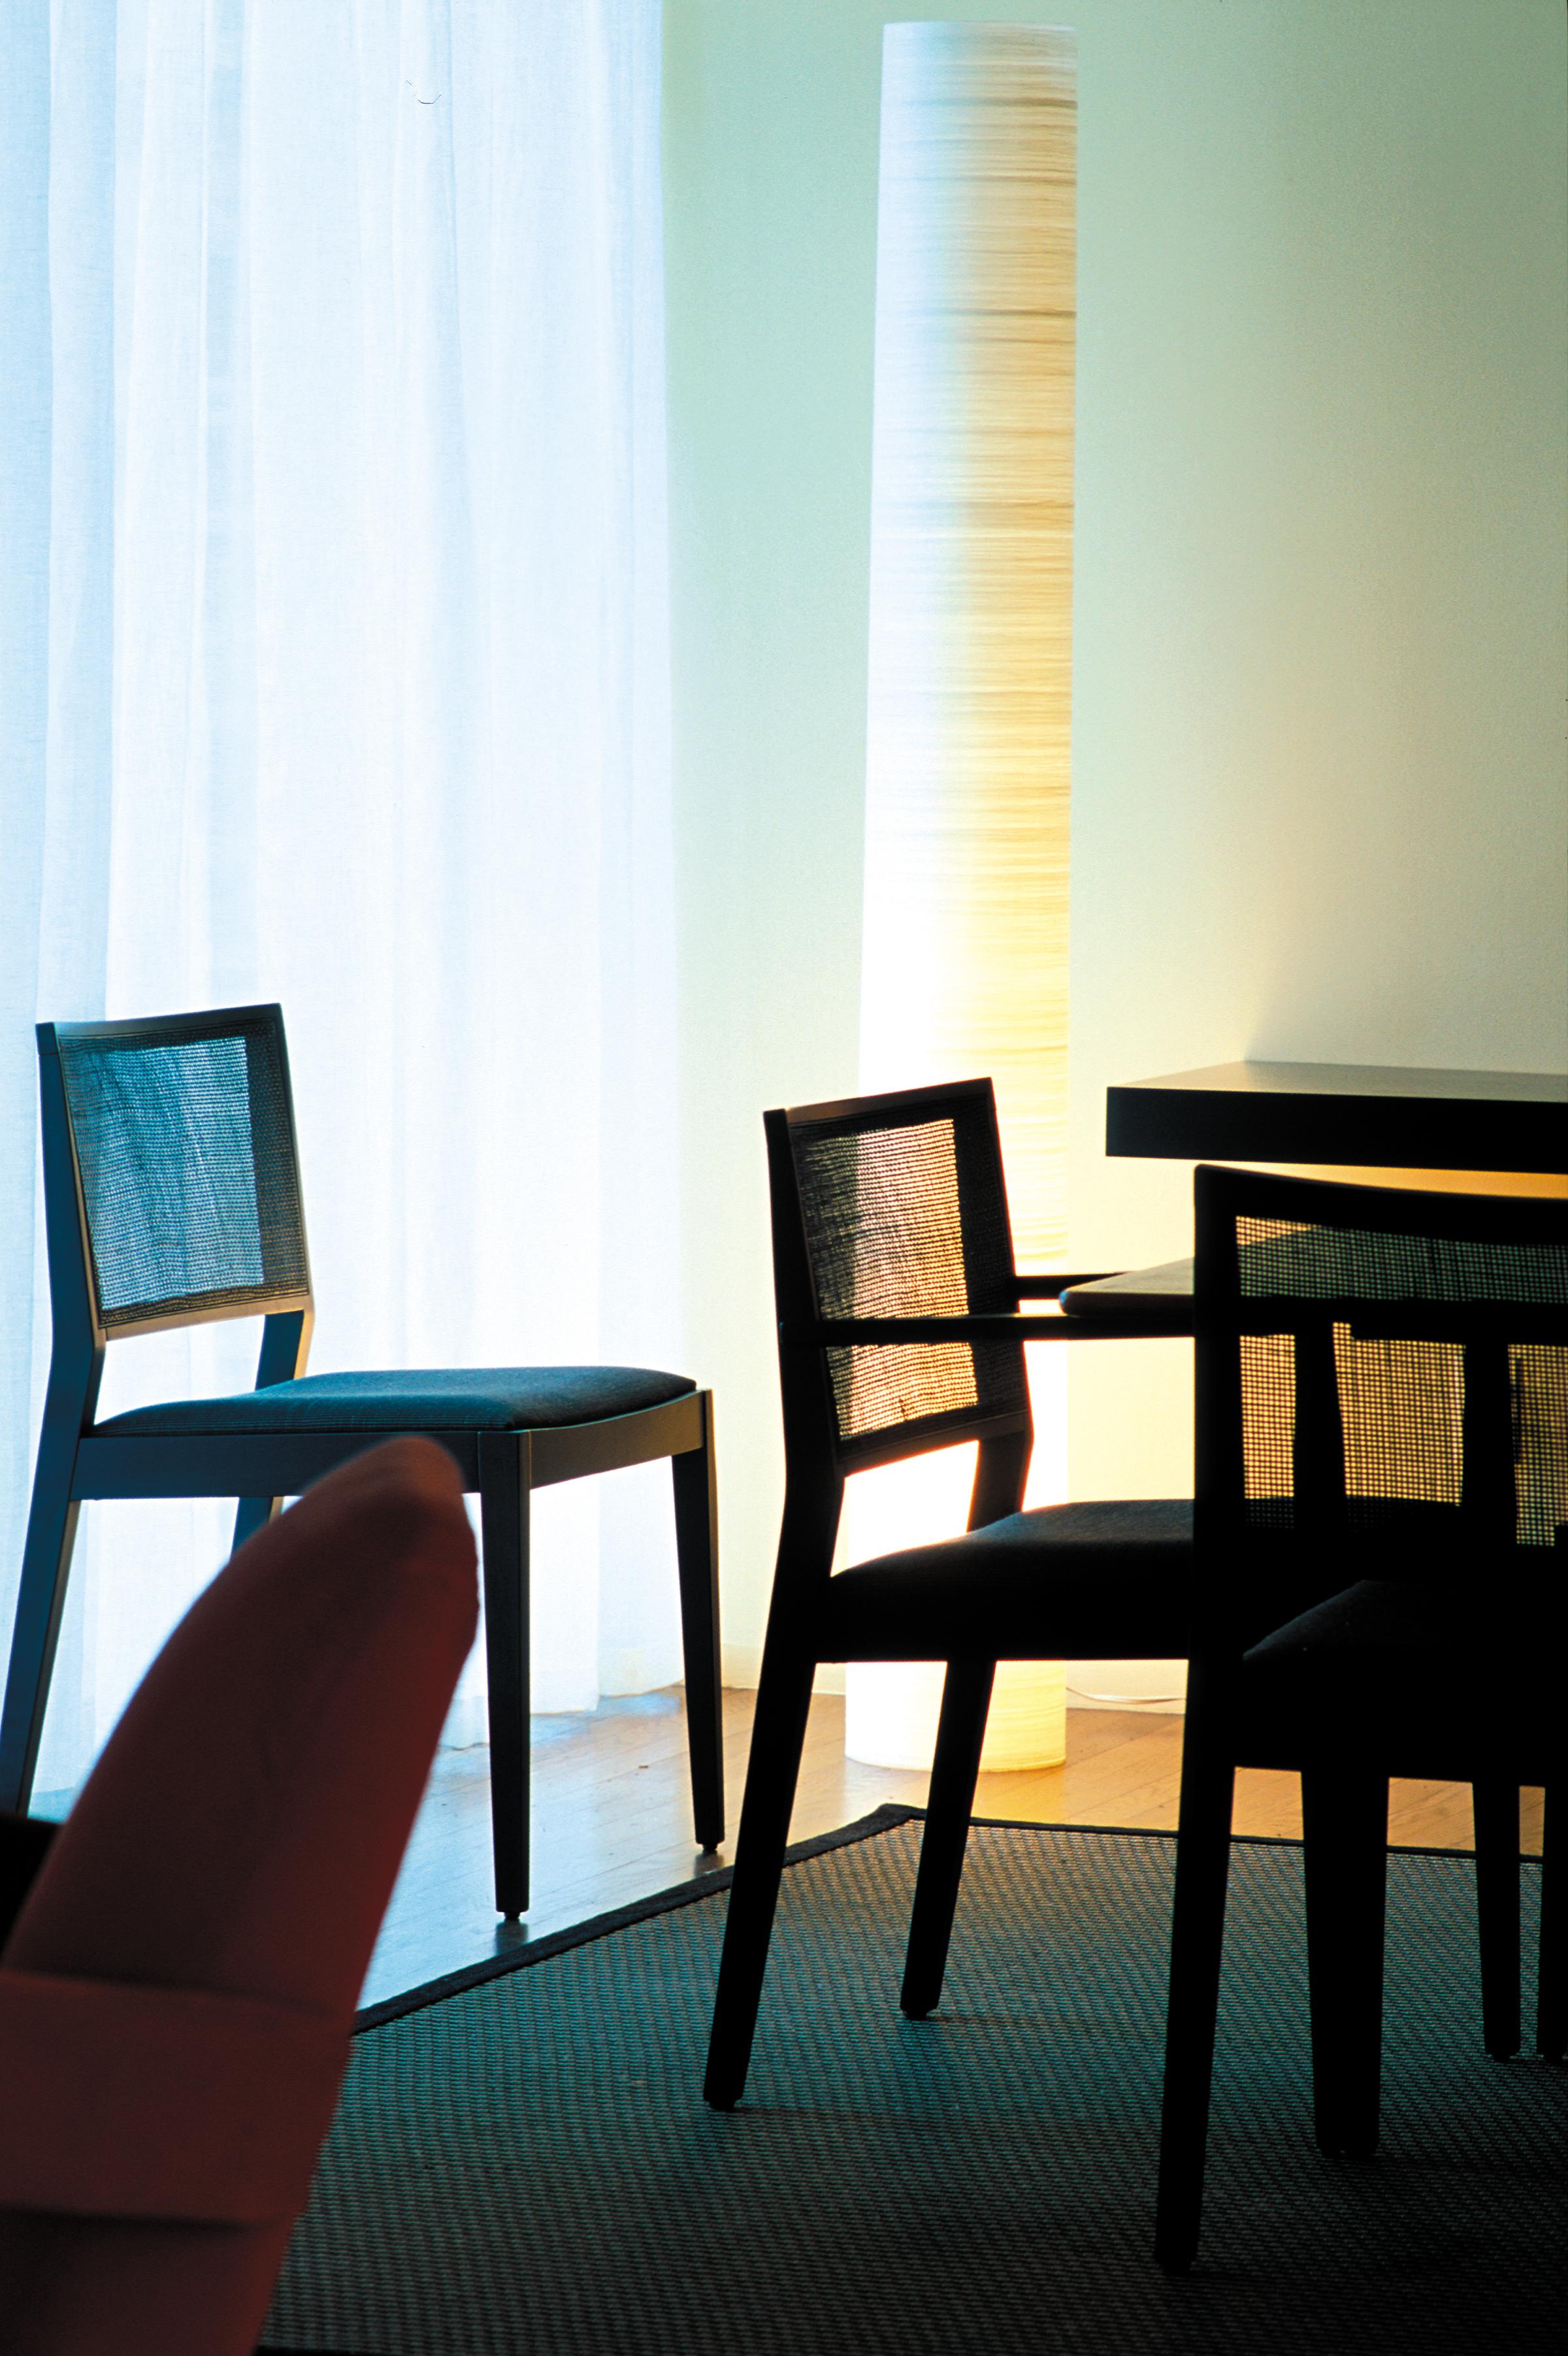 07-GPH-Dining-Room--chair-dtl.jpg